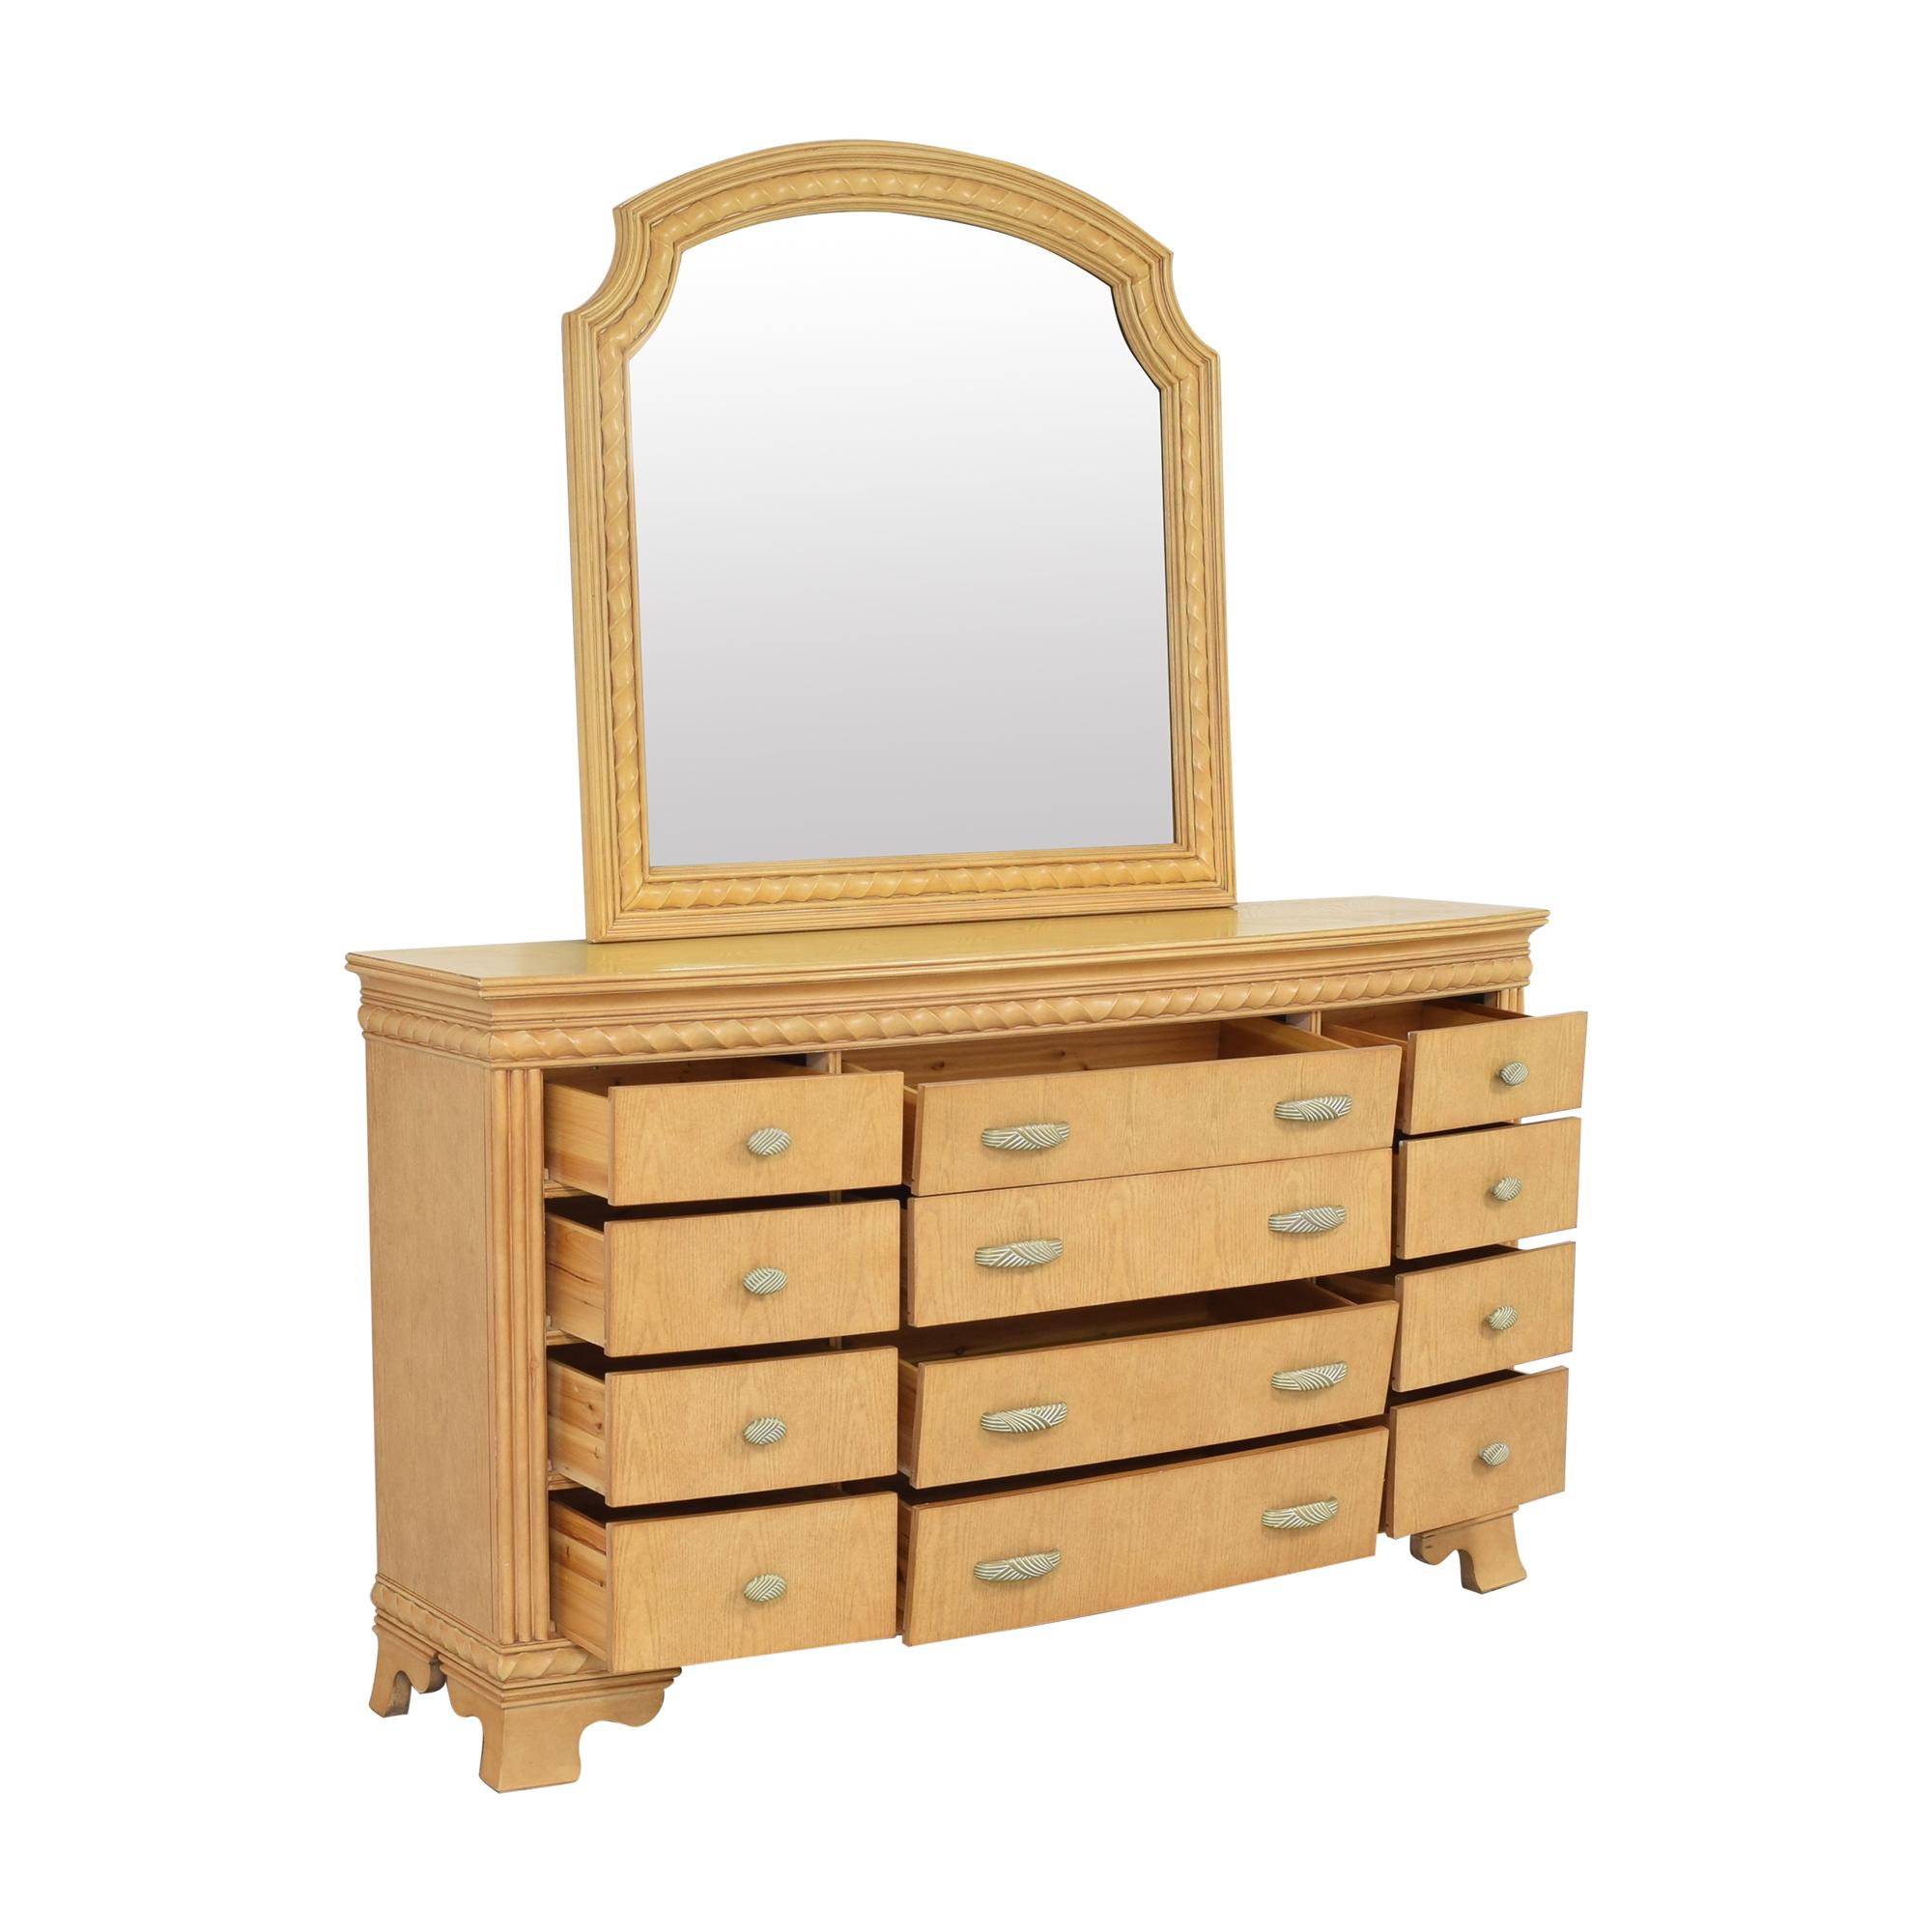 buy Raymour & Flanigan Triple Dresser with Mirror Raymour & Flanigan Dressers